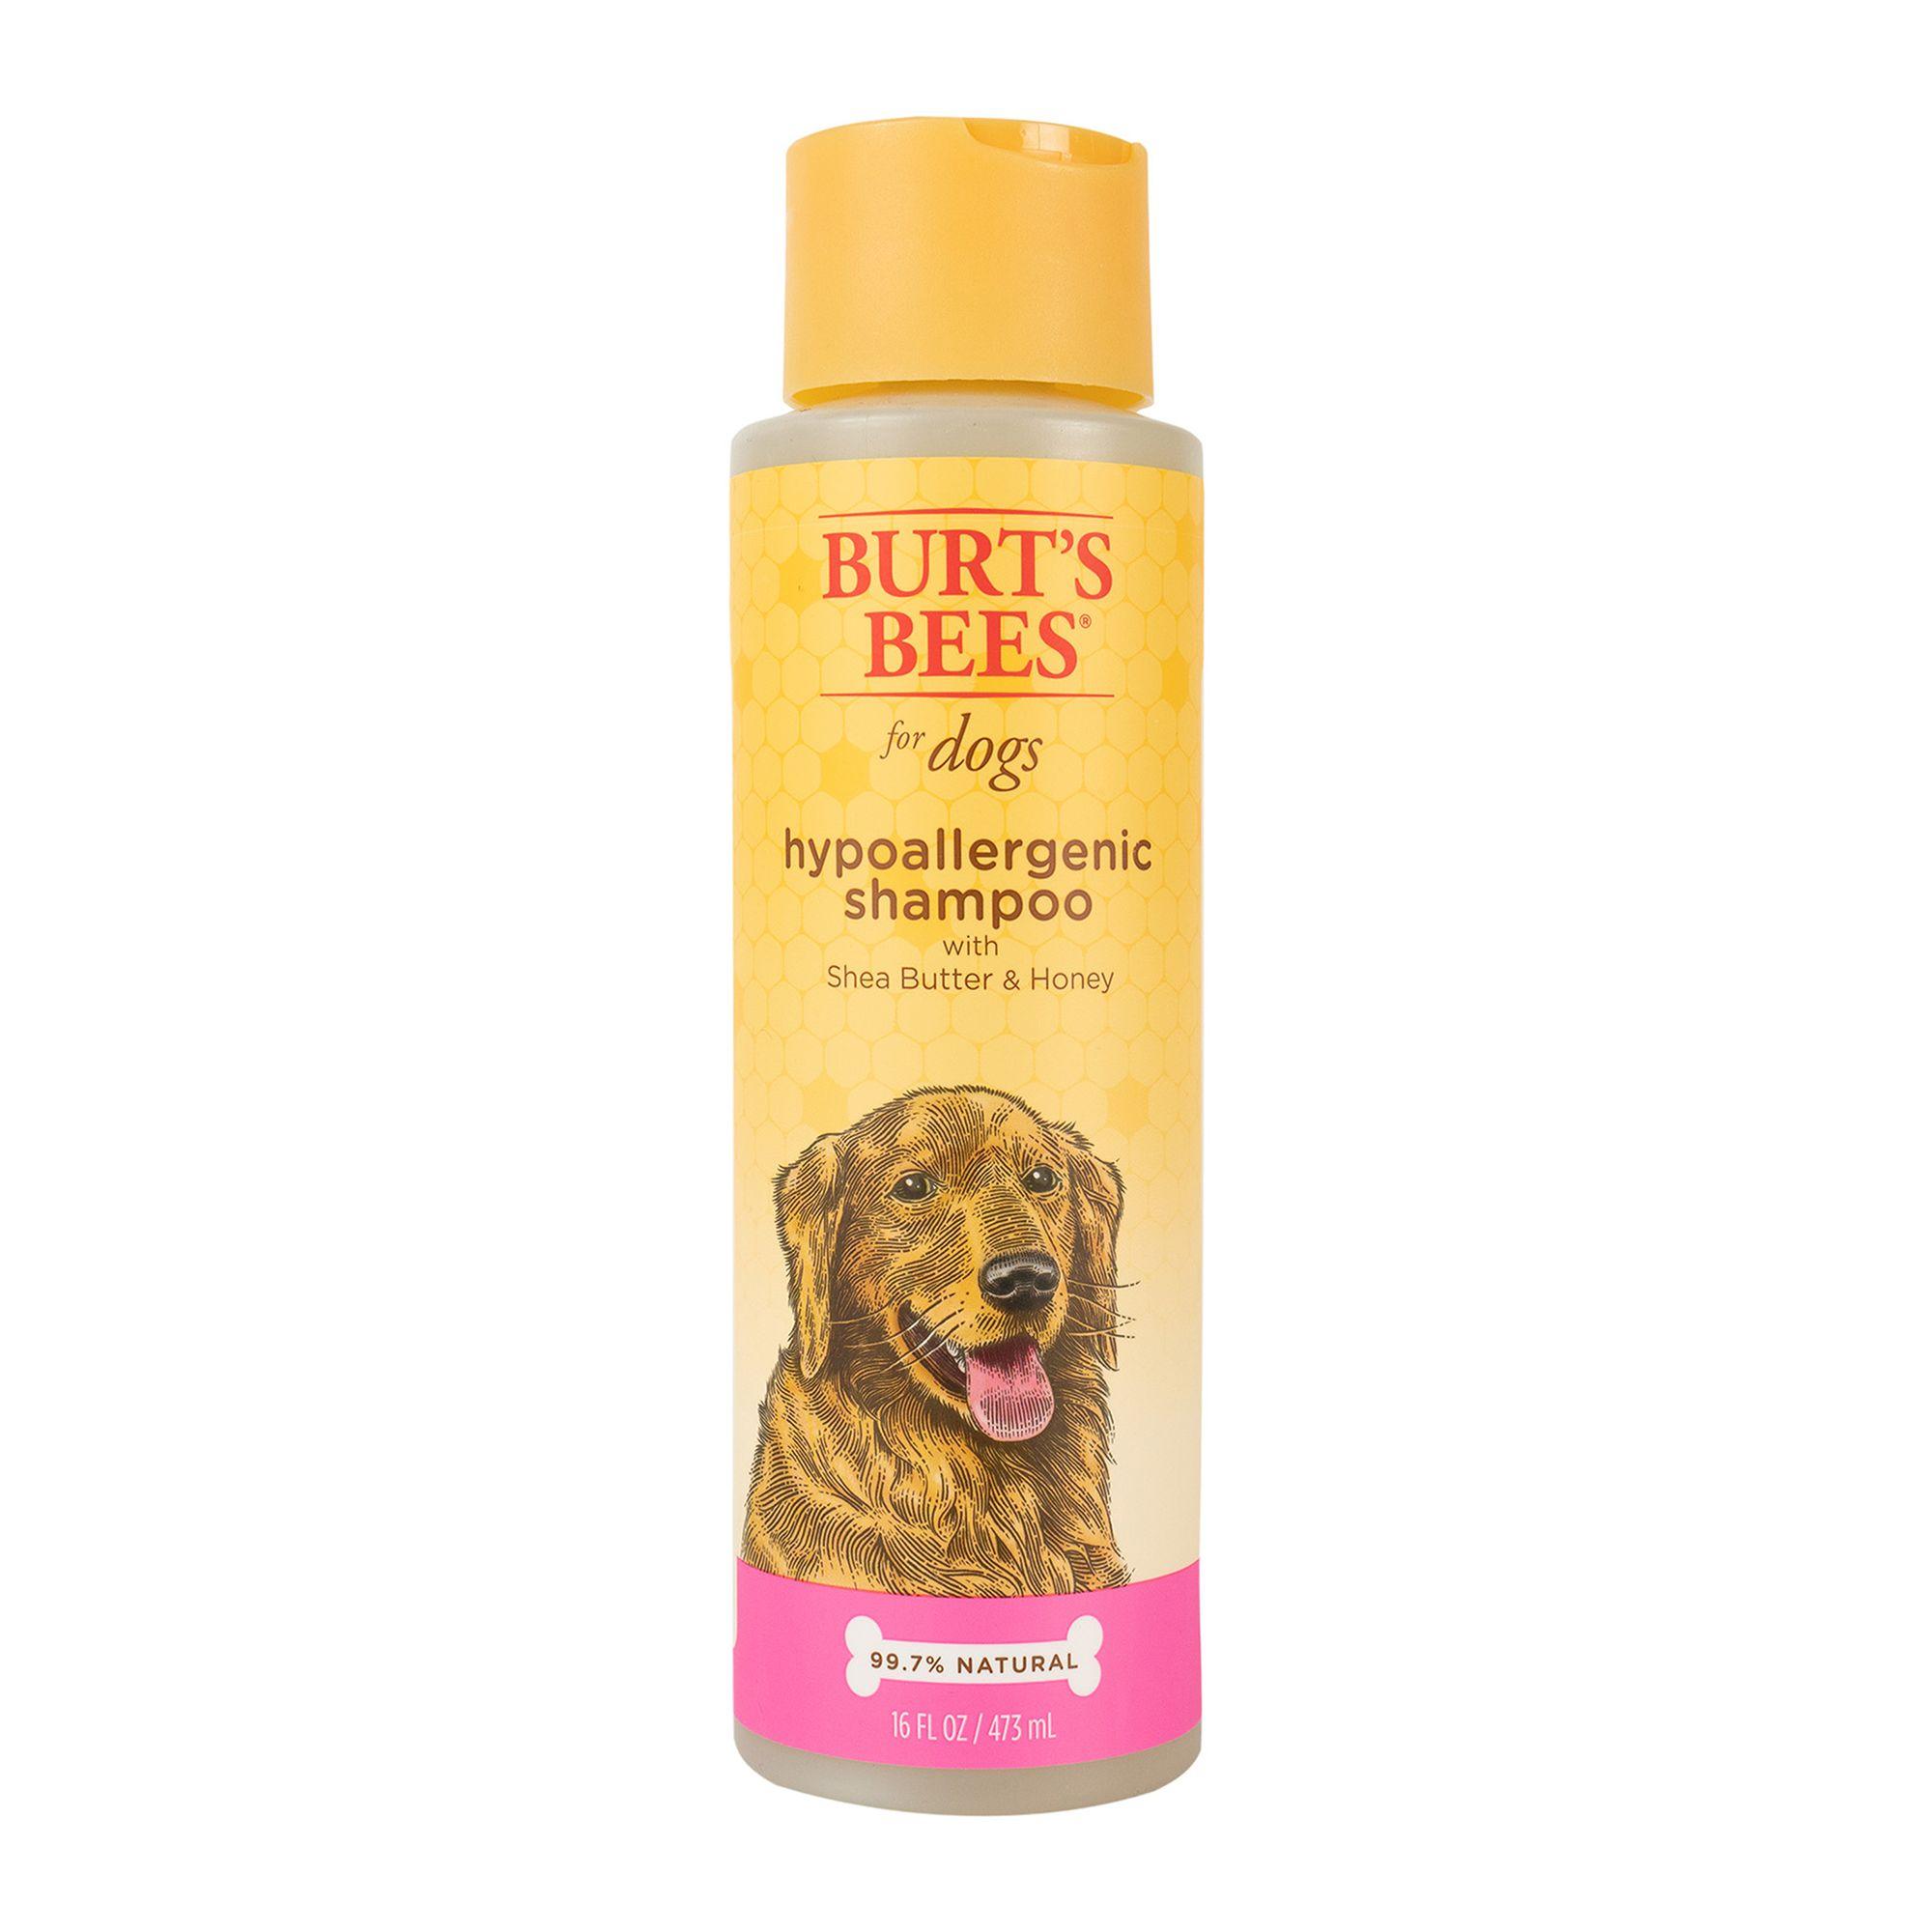 Burts Bees Hypoallergenic Dog Shampoo